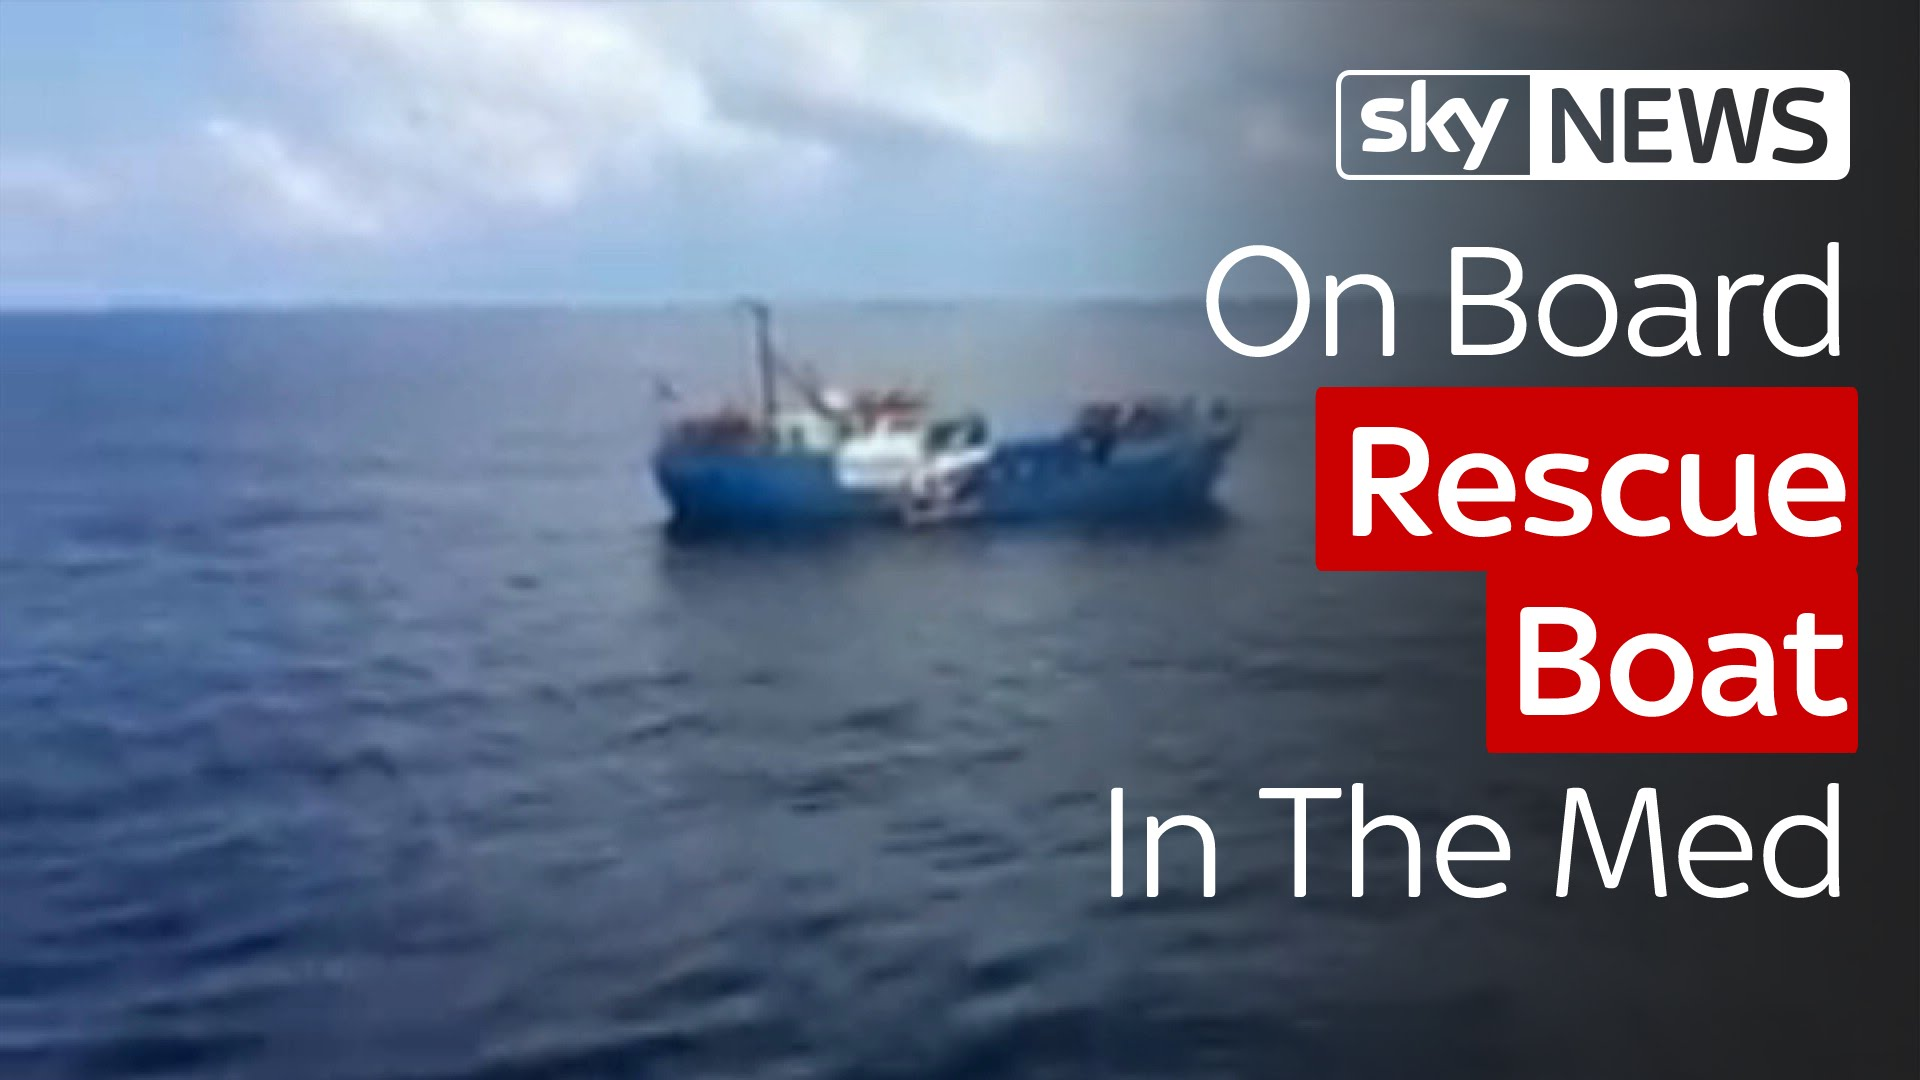 On Board Rescue Boat In The Mediterranean 10